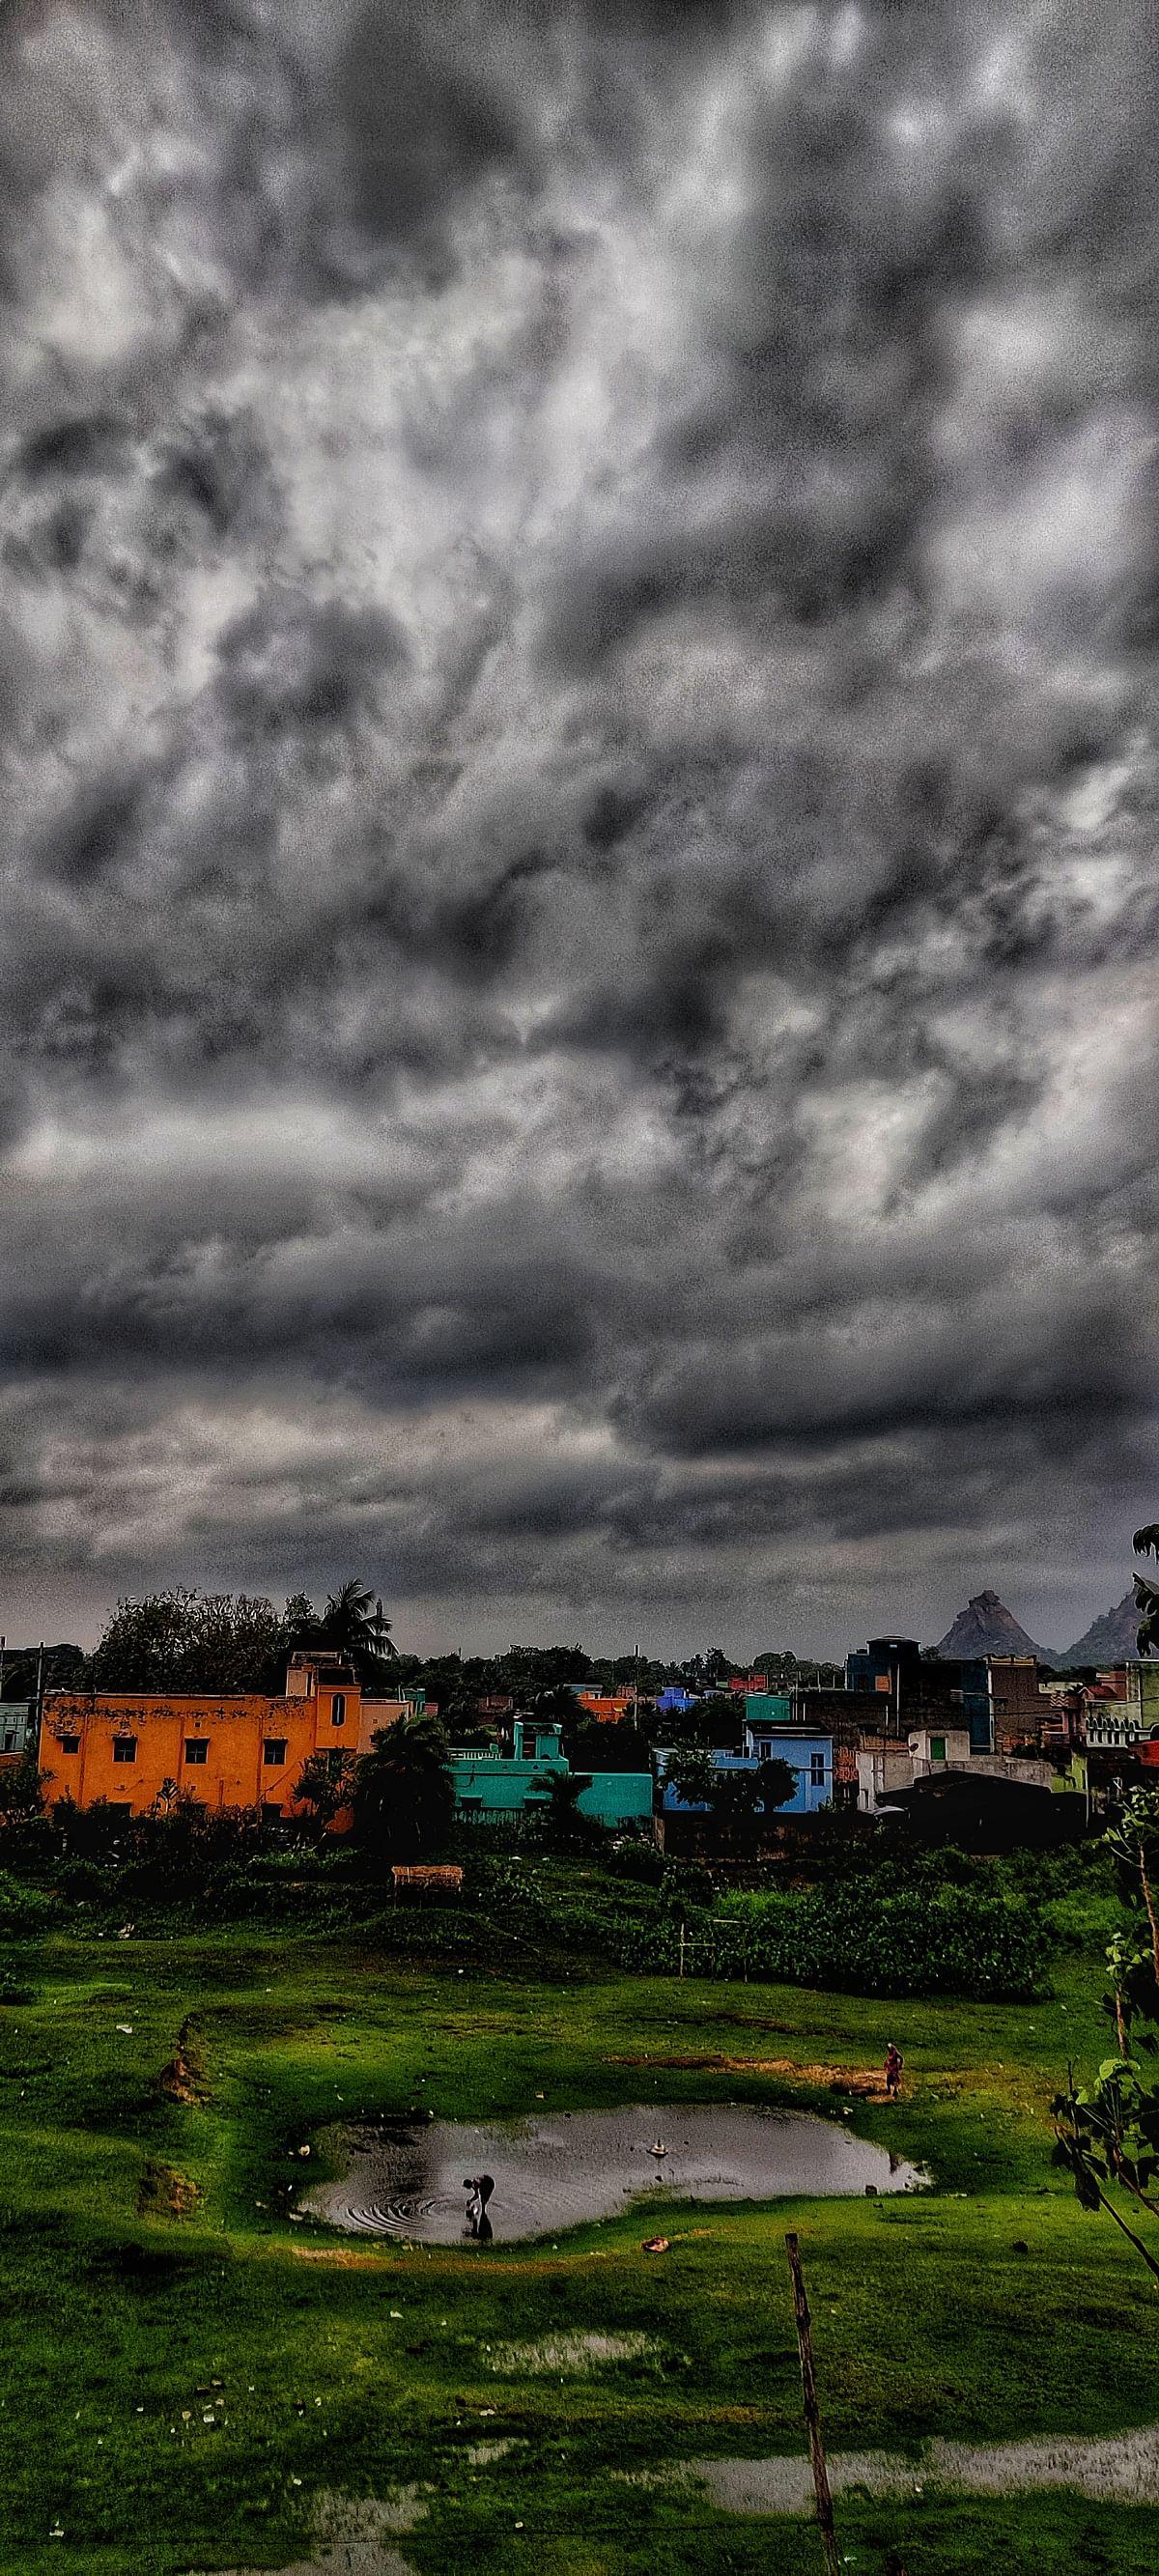 Raghunathpur witnessing a dark cloud cover and intermittent rain.